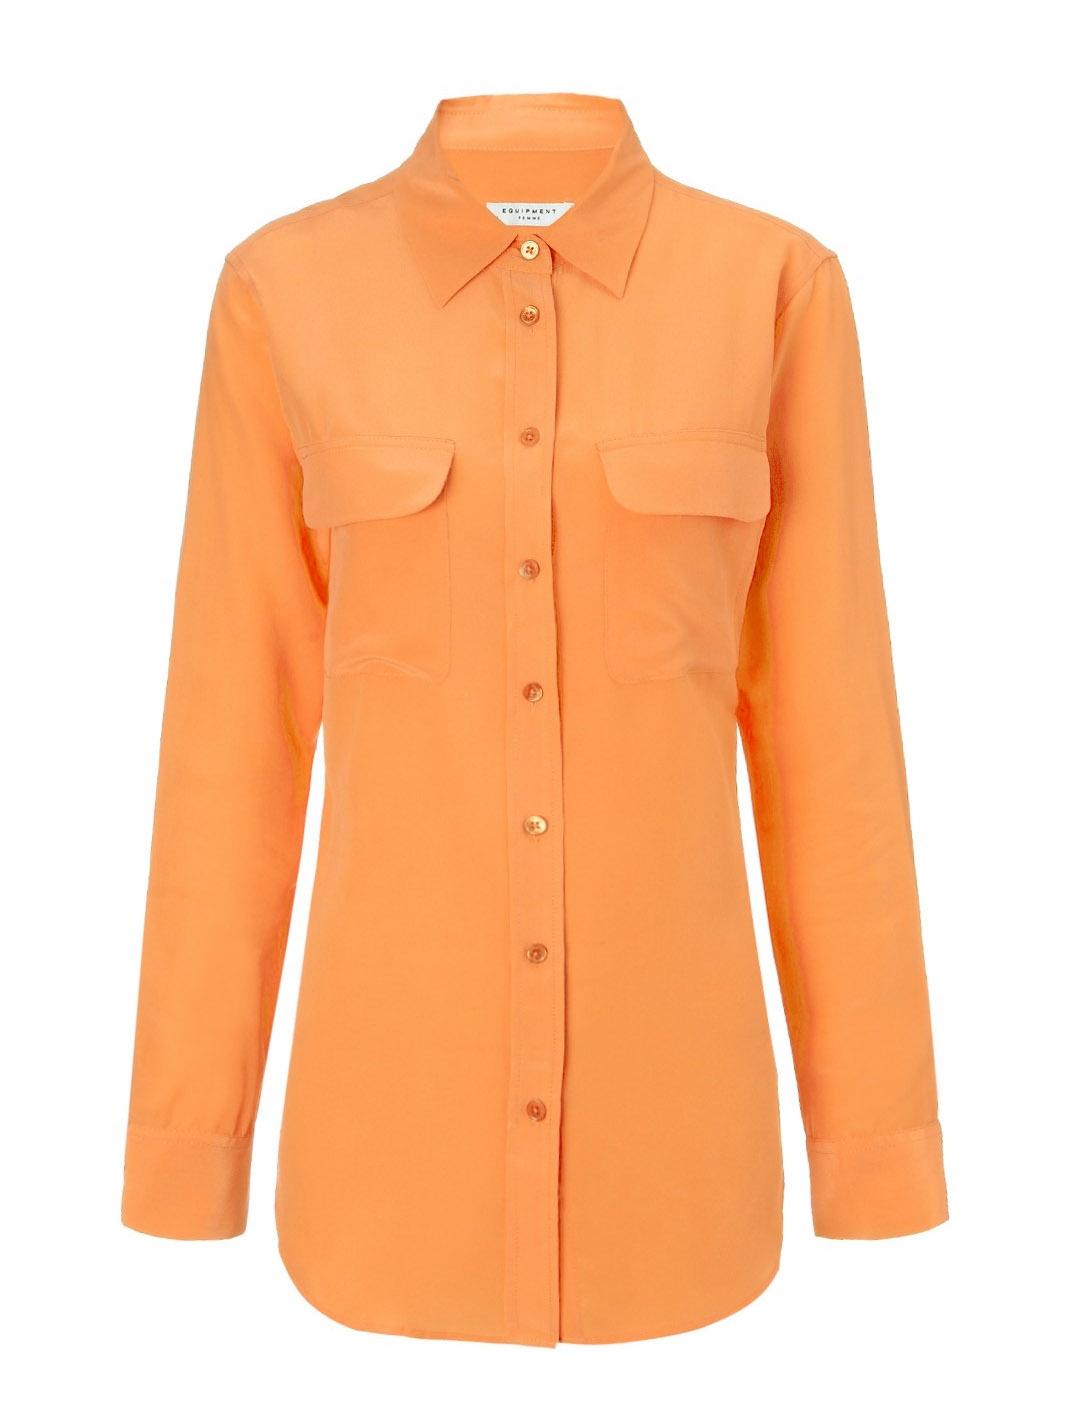 4aacab8ad Louise Paris - EQUIPMENT Signature apricot orange silk shirt Retail price  €220 Size S